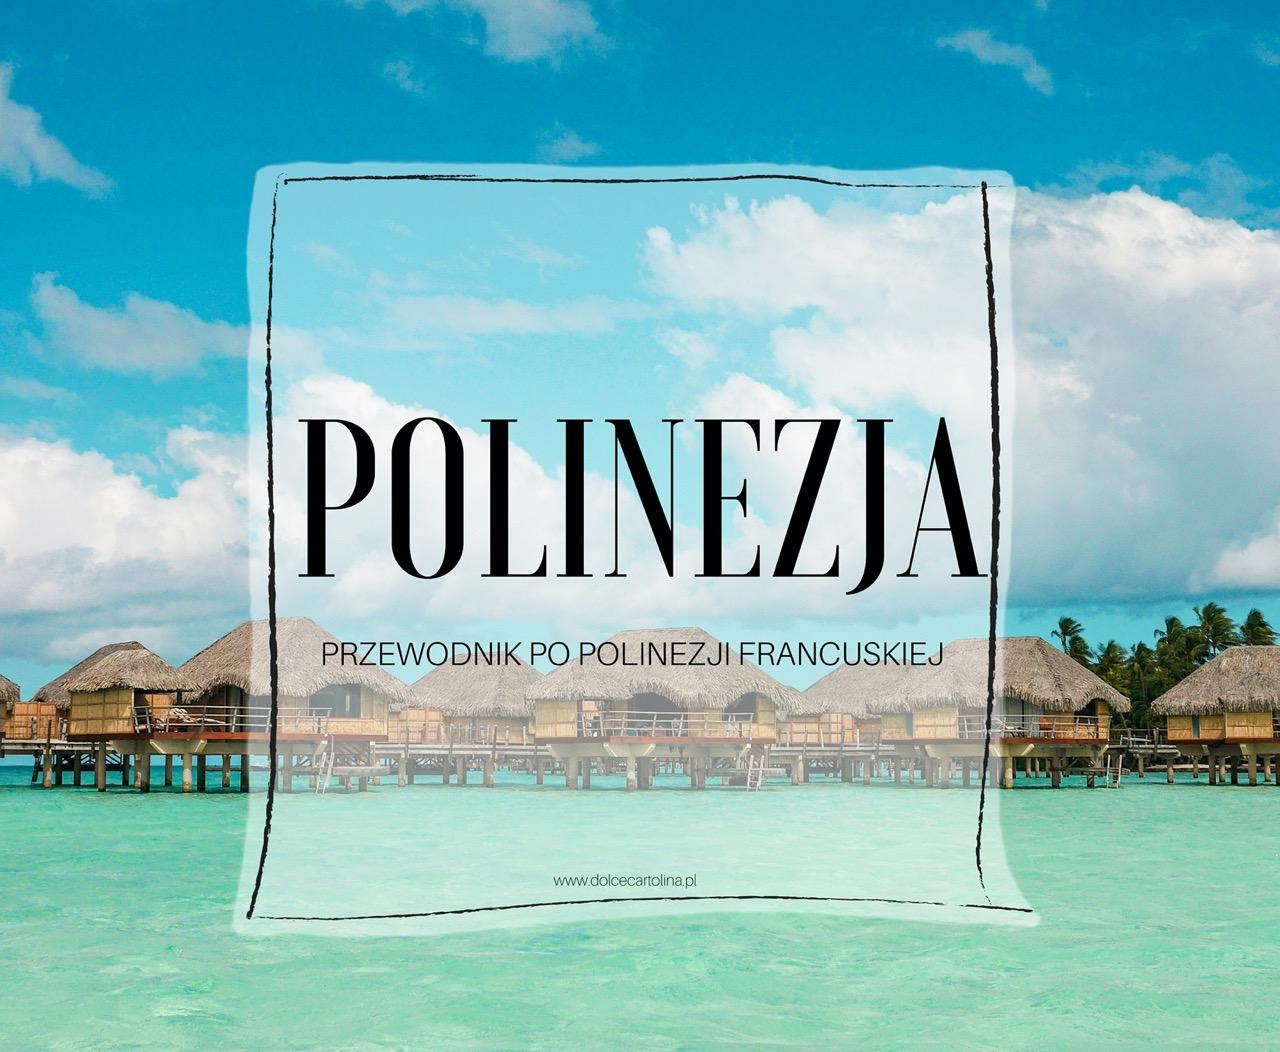 polinezja francuska przewodnik po polinezji francuskiej